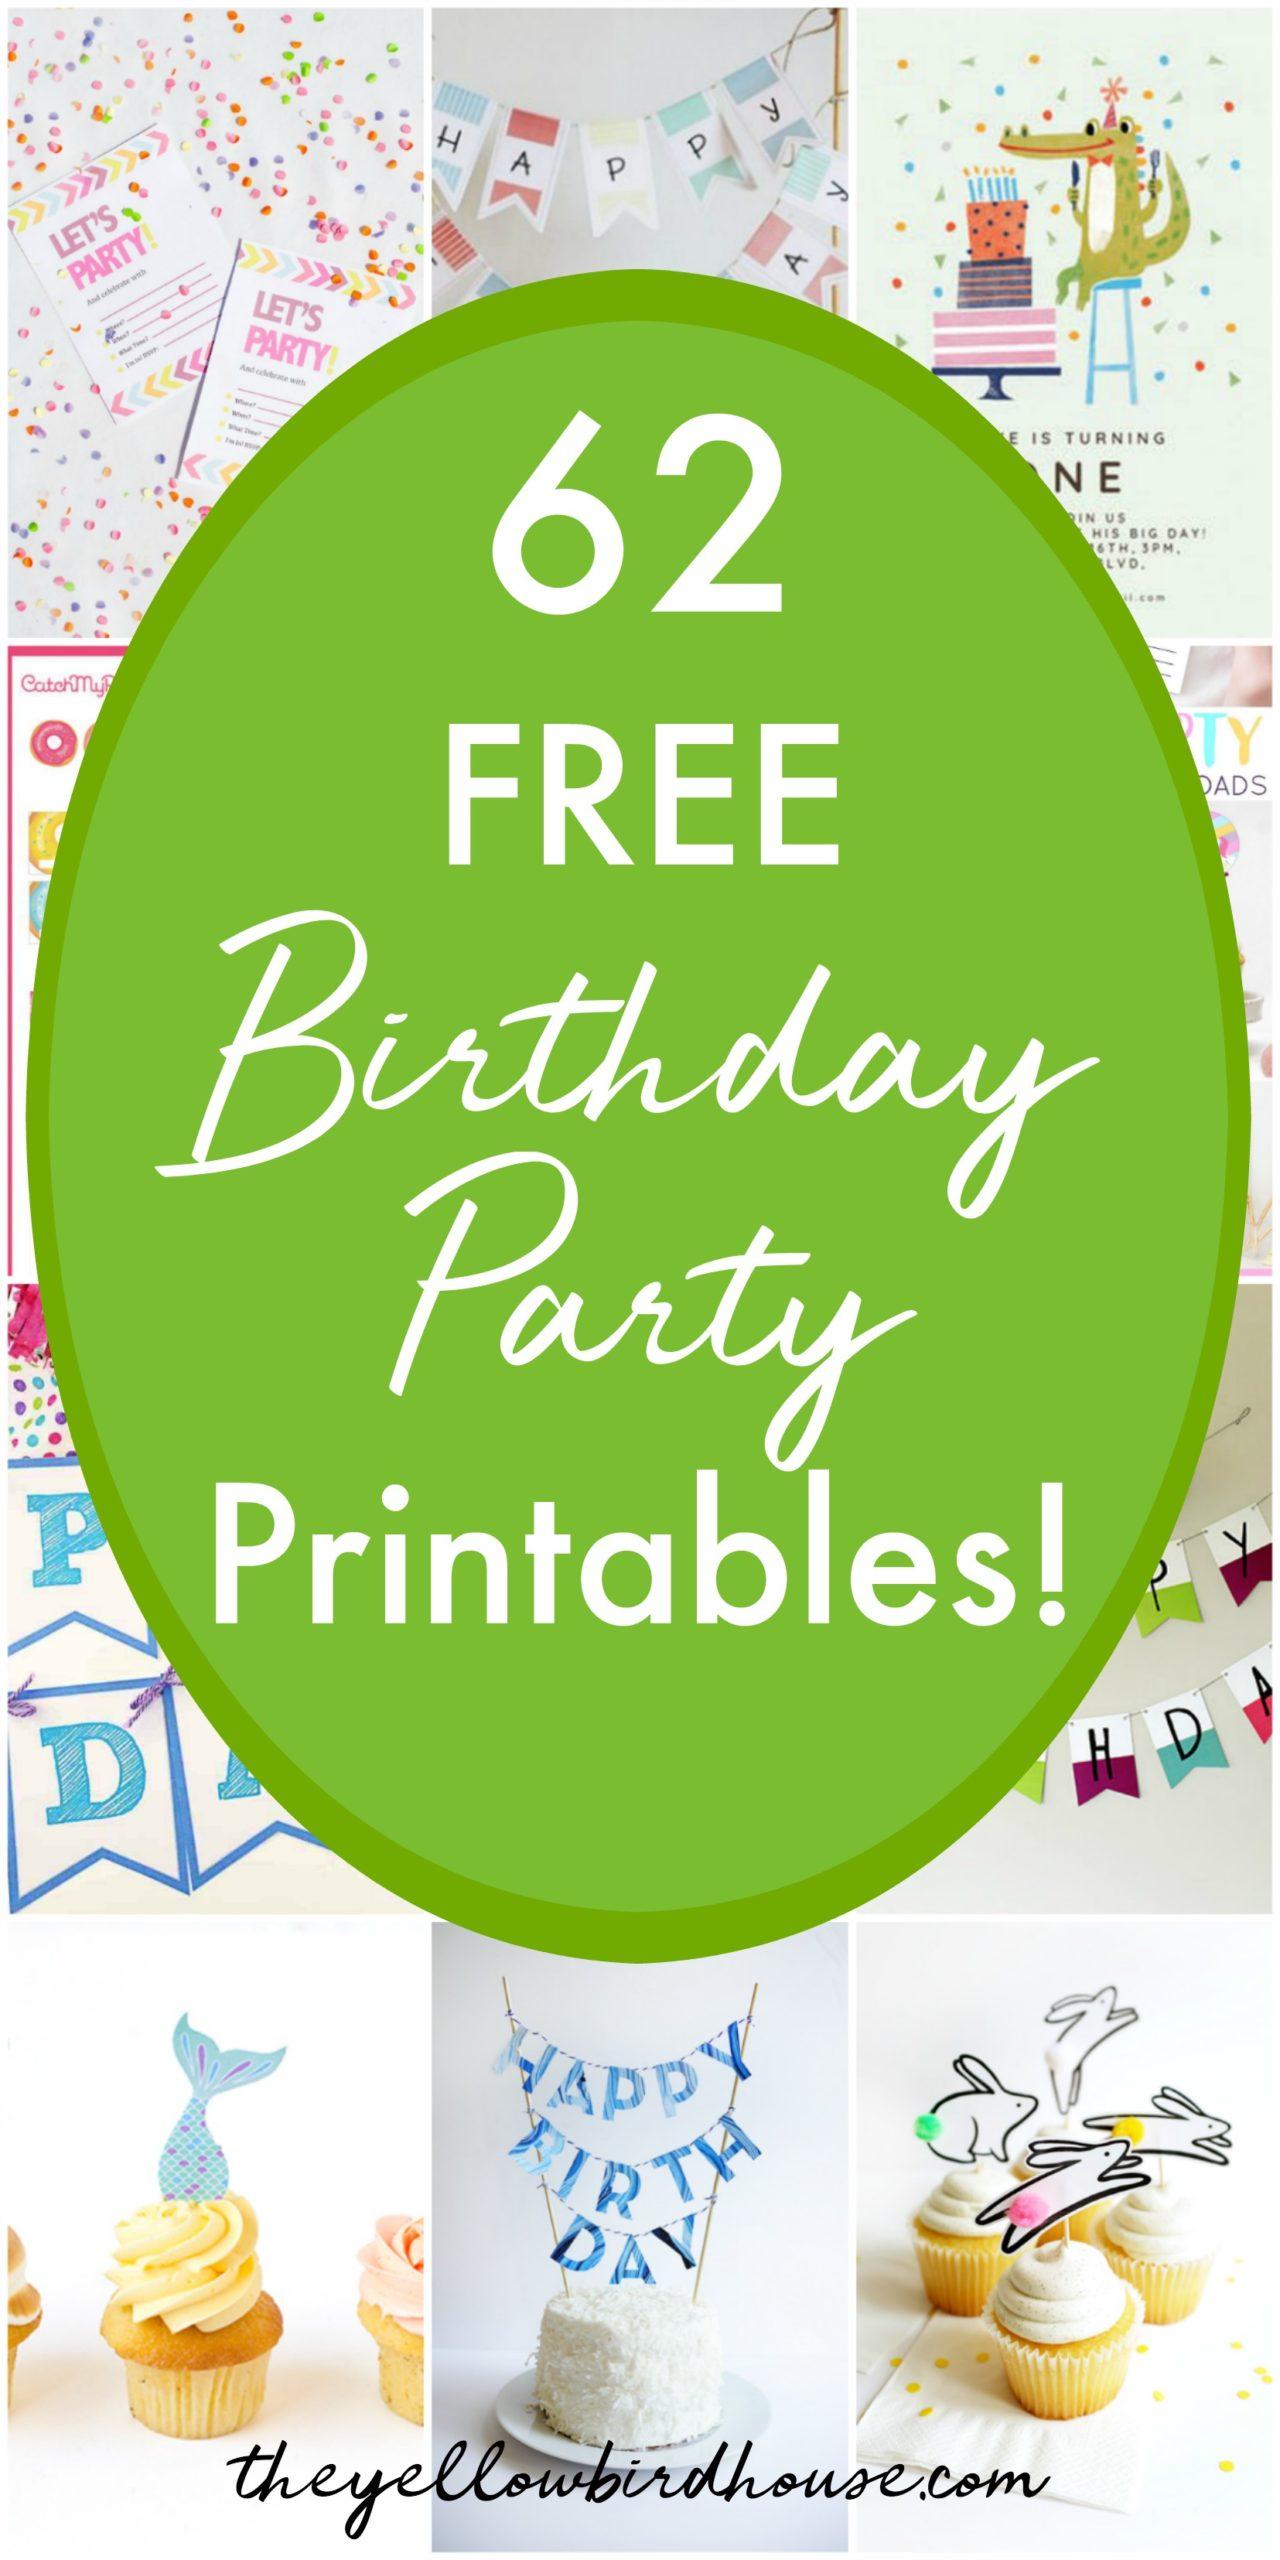 62 Free Birthday Party Printables The Yellow Birdhouse